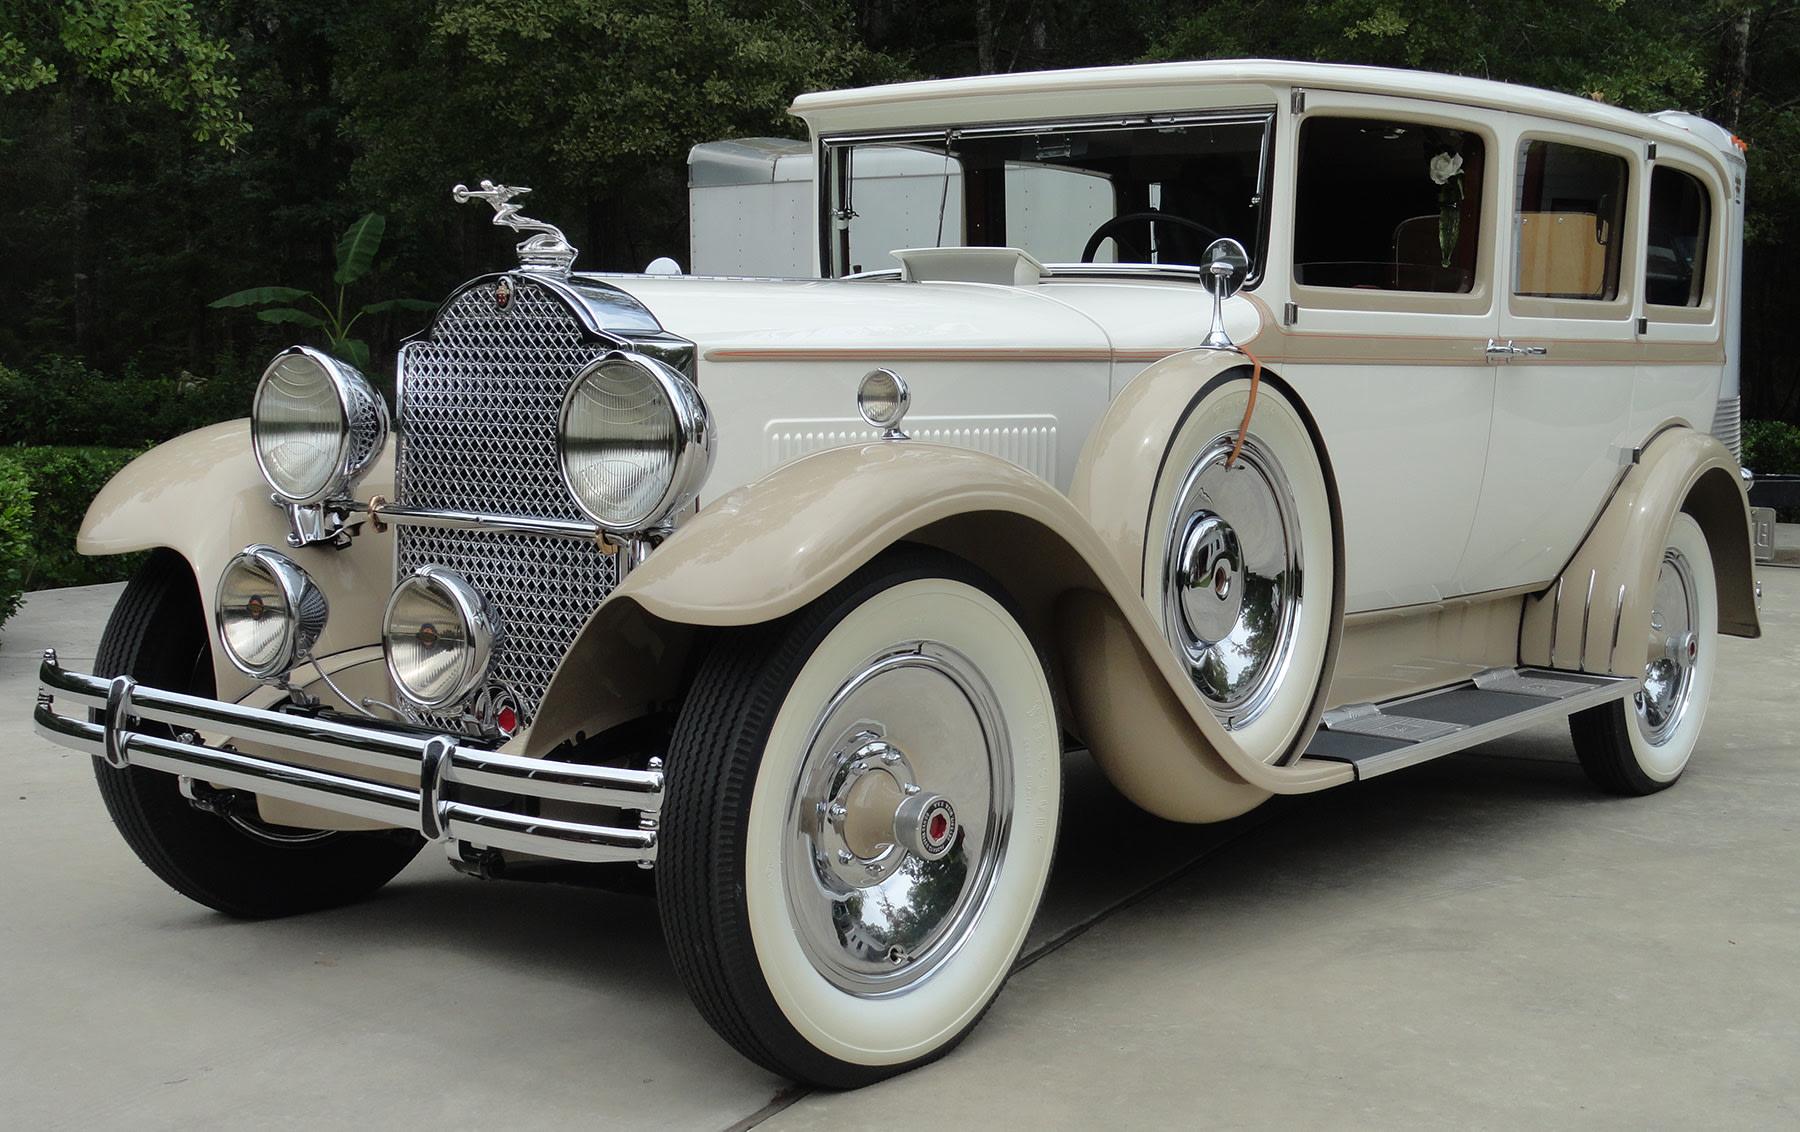 1930 Packard 733 Seven-Passenger Sedan